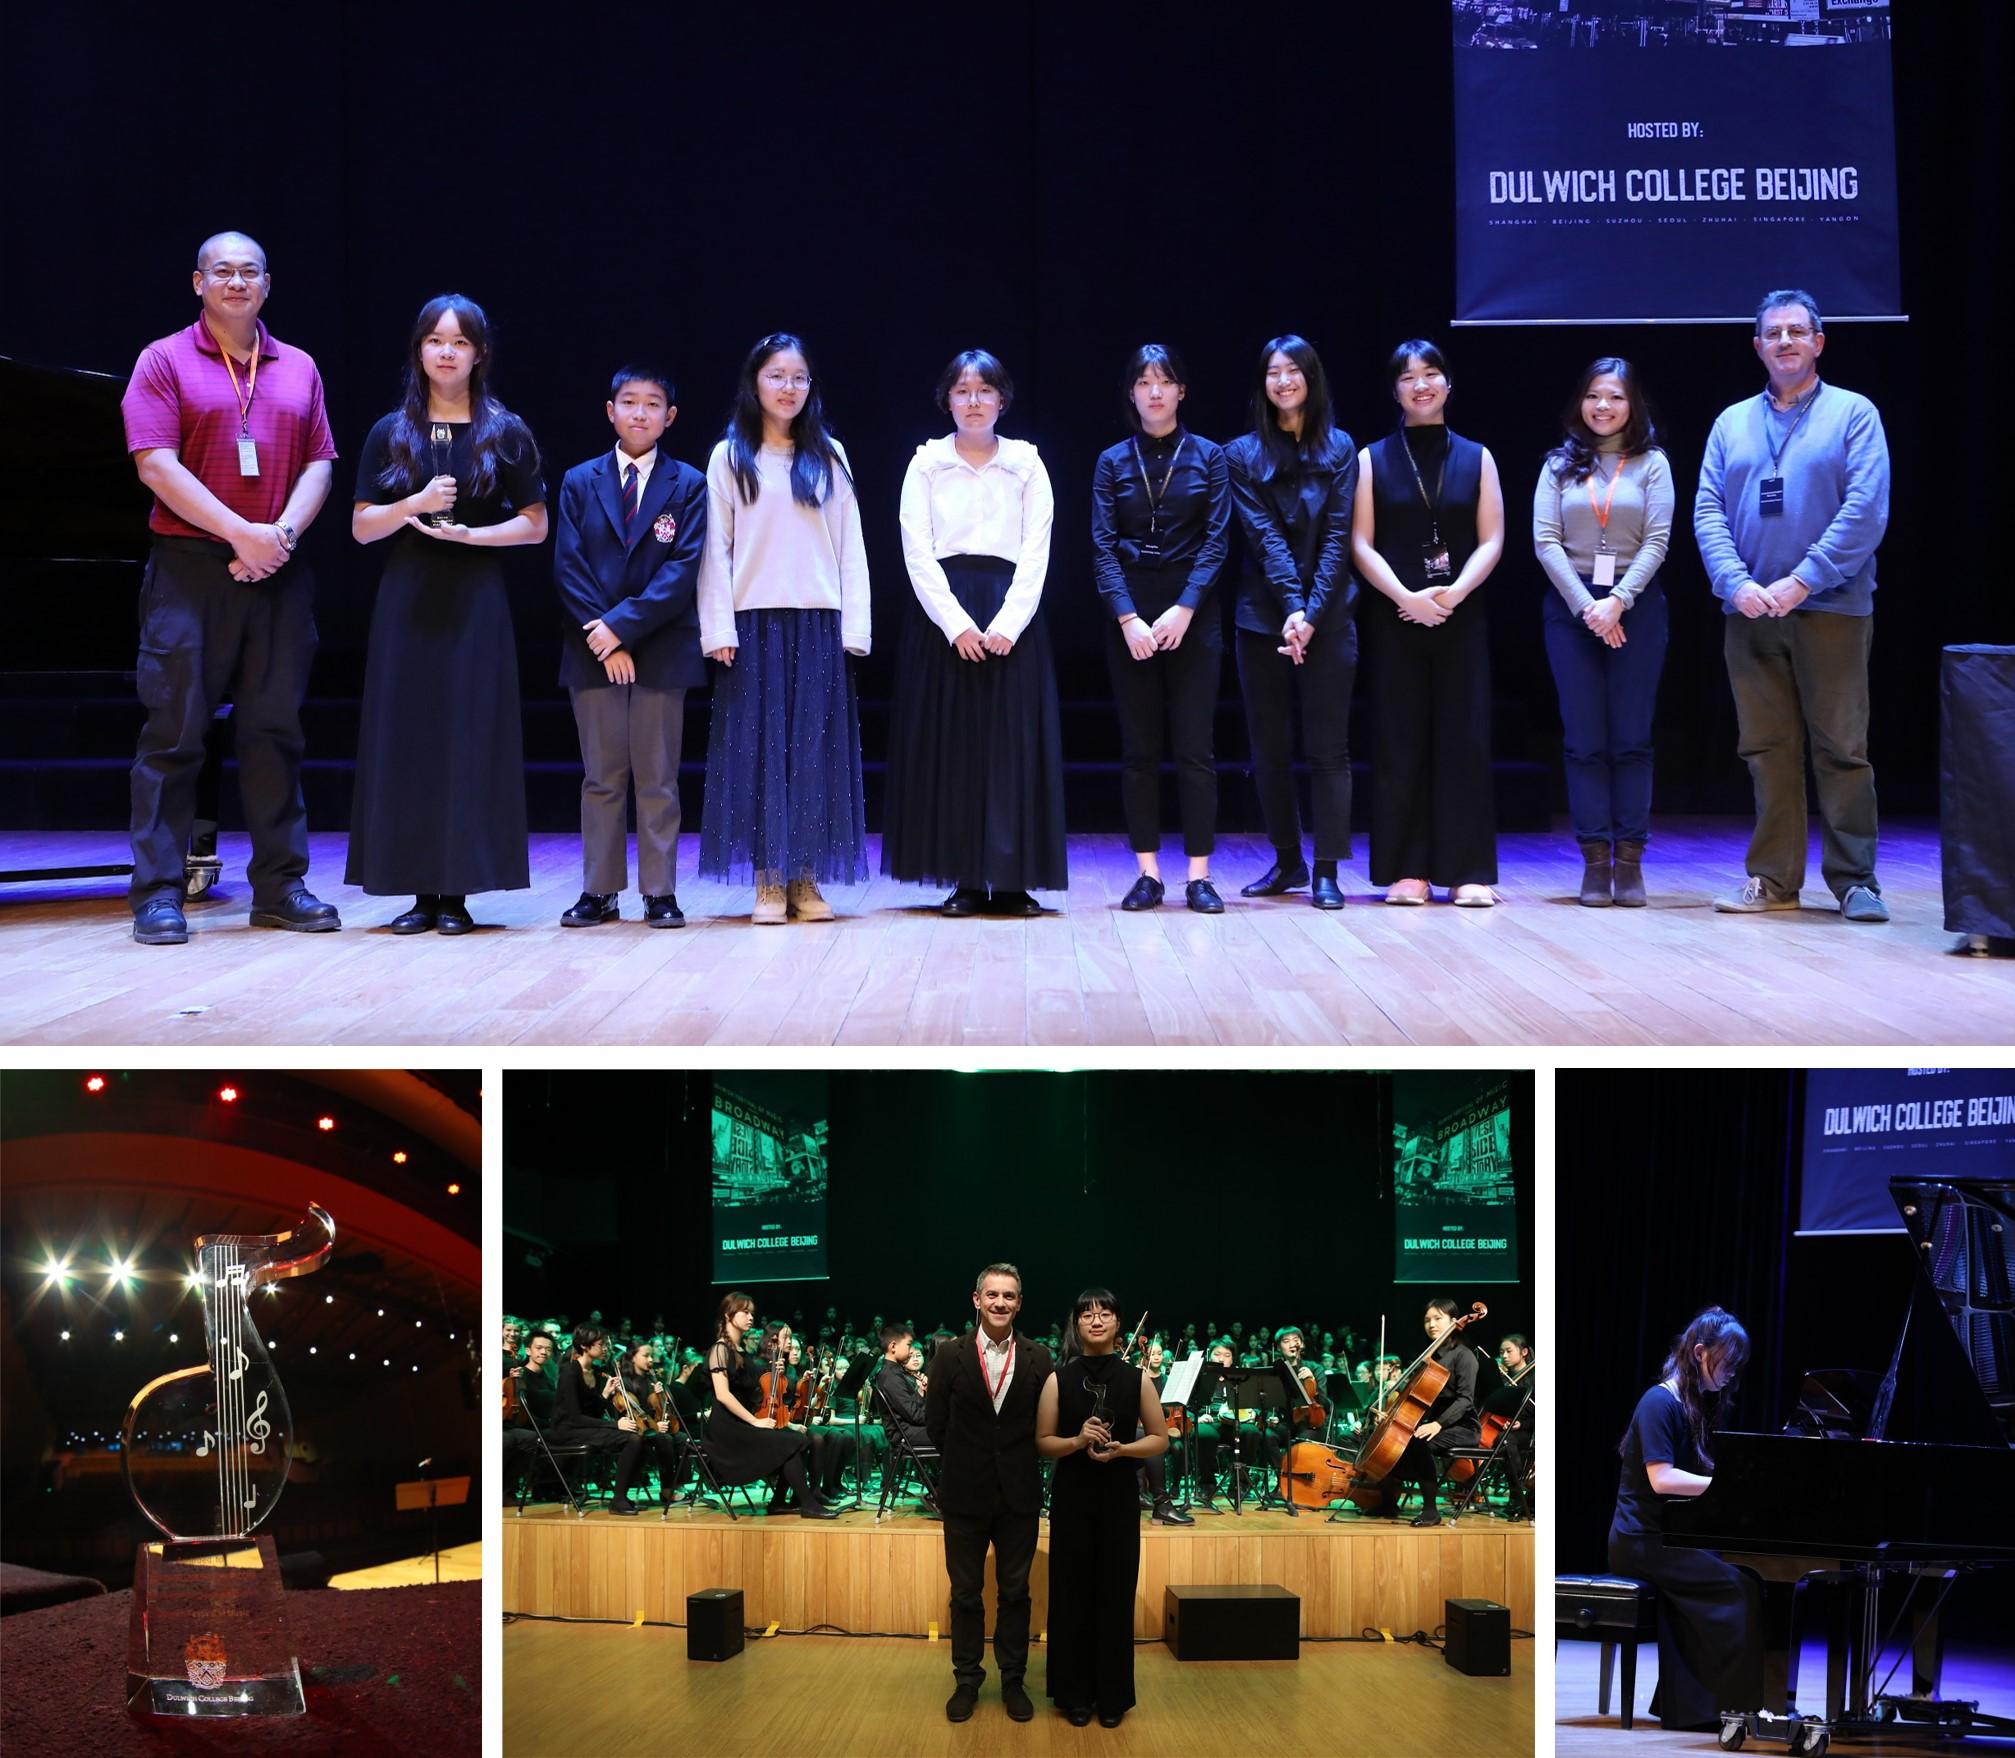 dfm-at-dcb-2019-young-musicians-北京德威英国国际学校